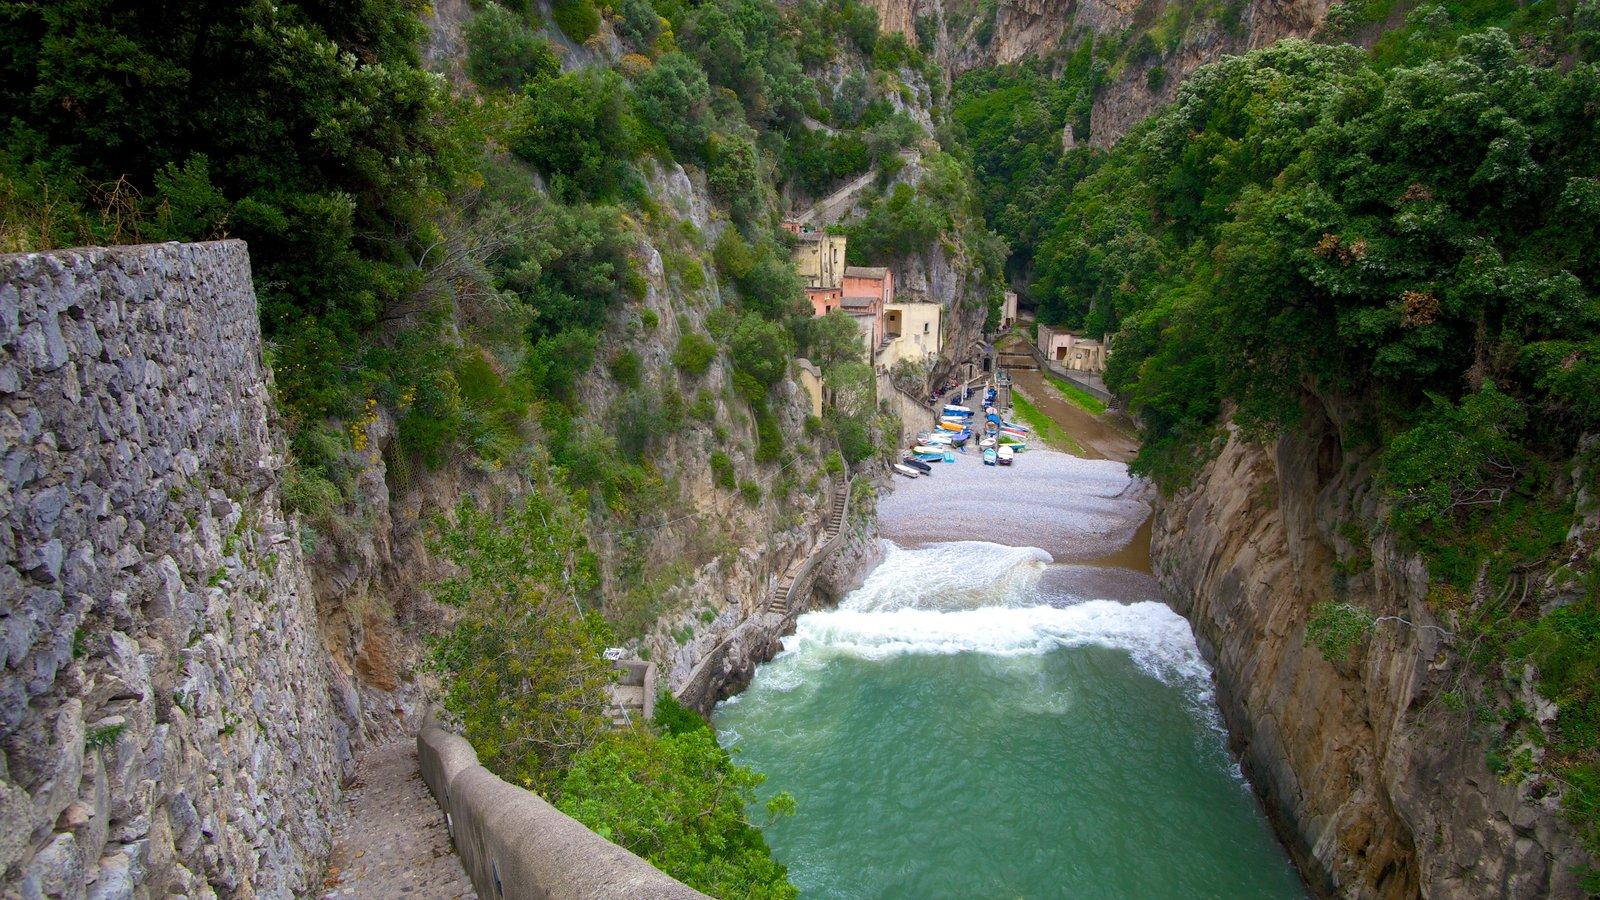 Fiordo di Furore showing a gorge or canyon, rocky coastline and general coastal views